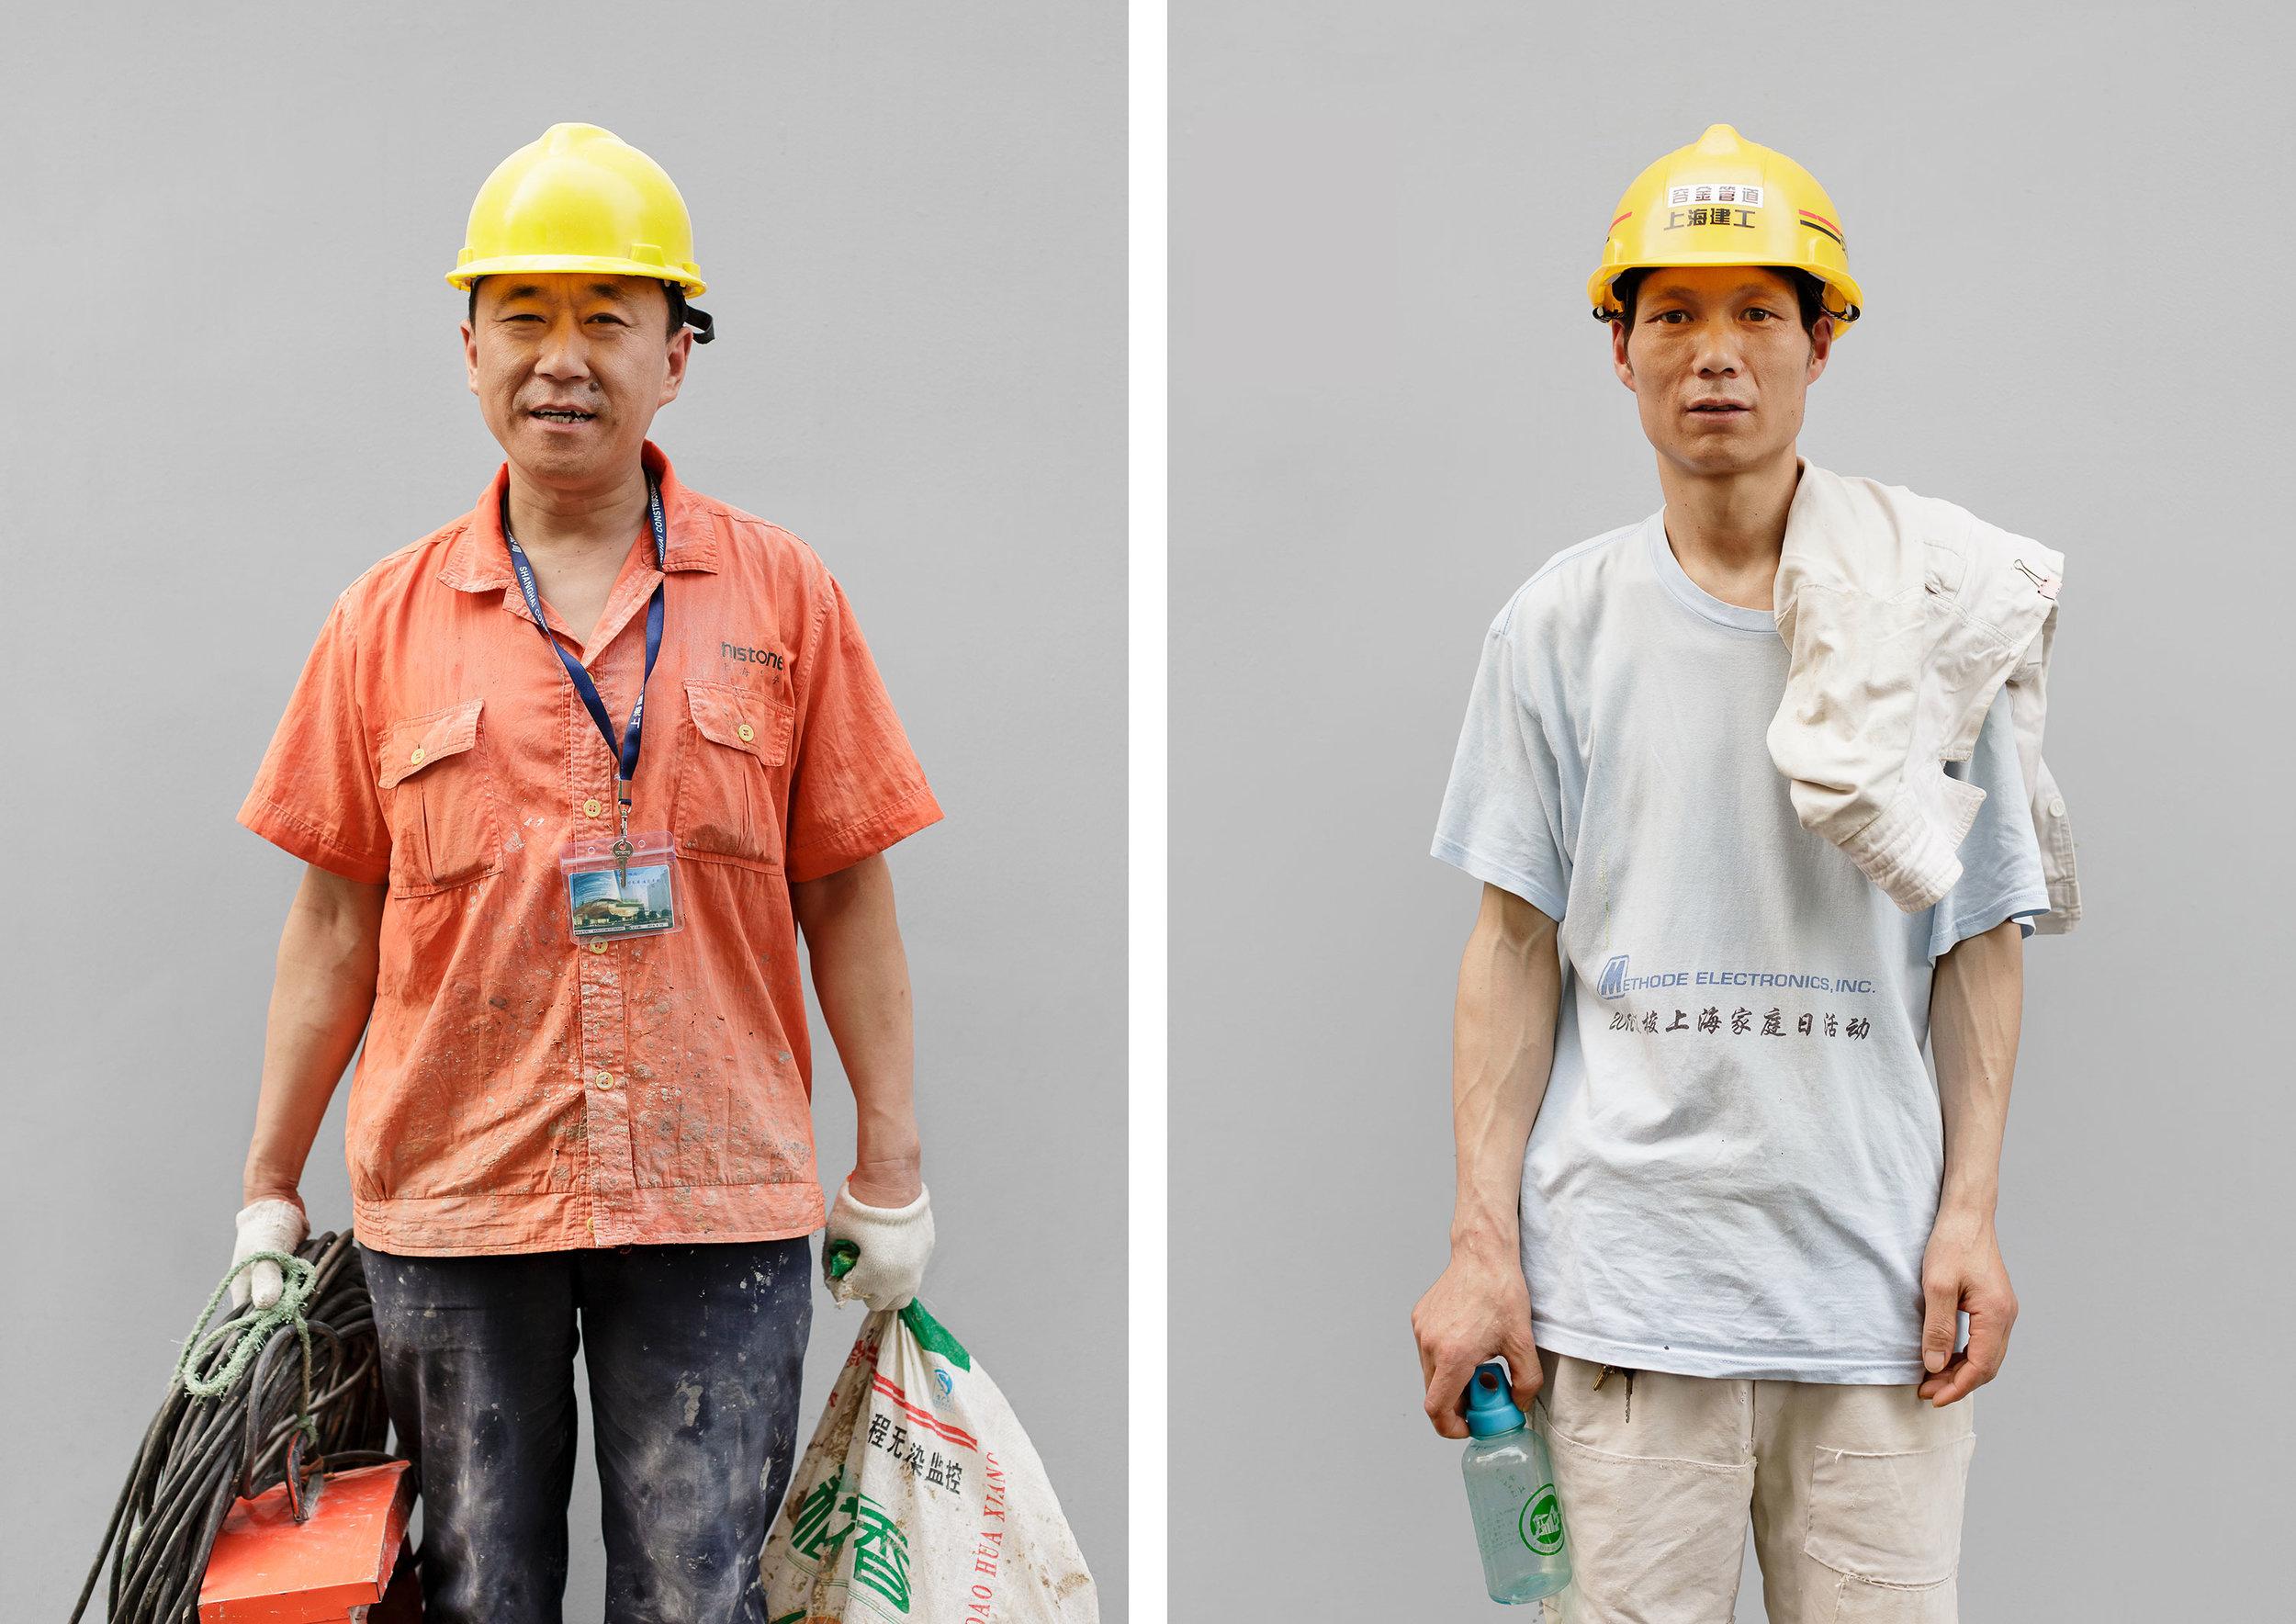 Shanghai_Tower-workers-and-building23.jpg